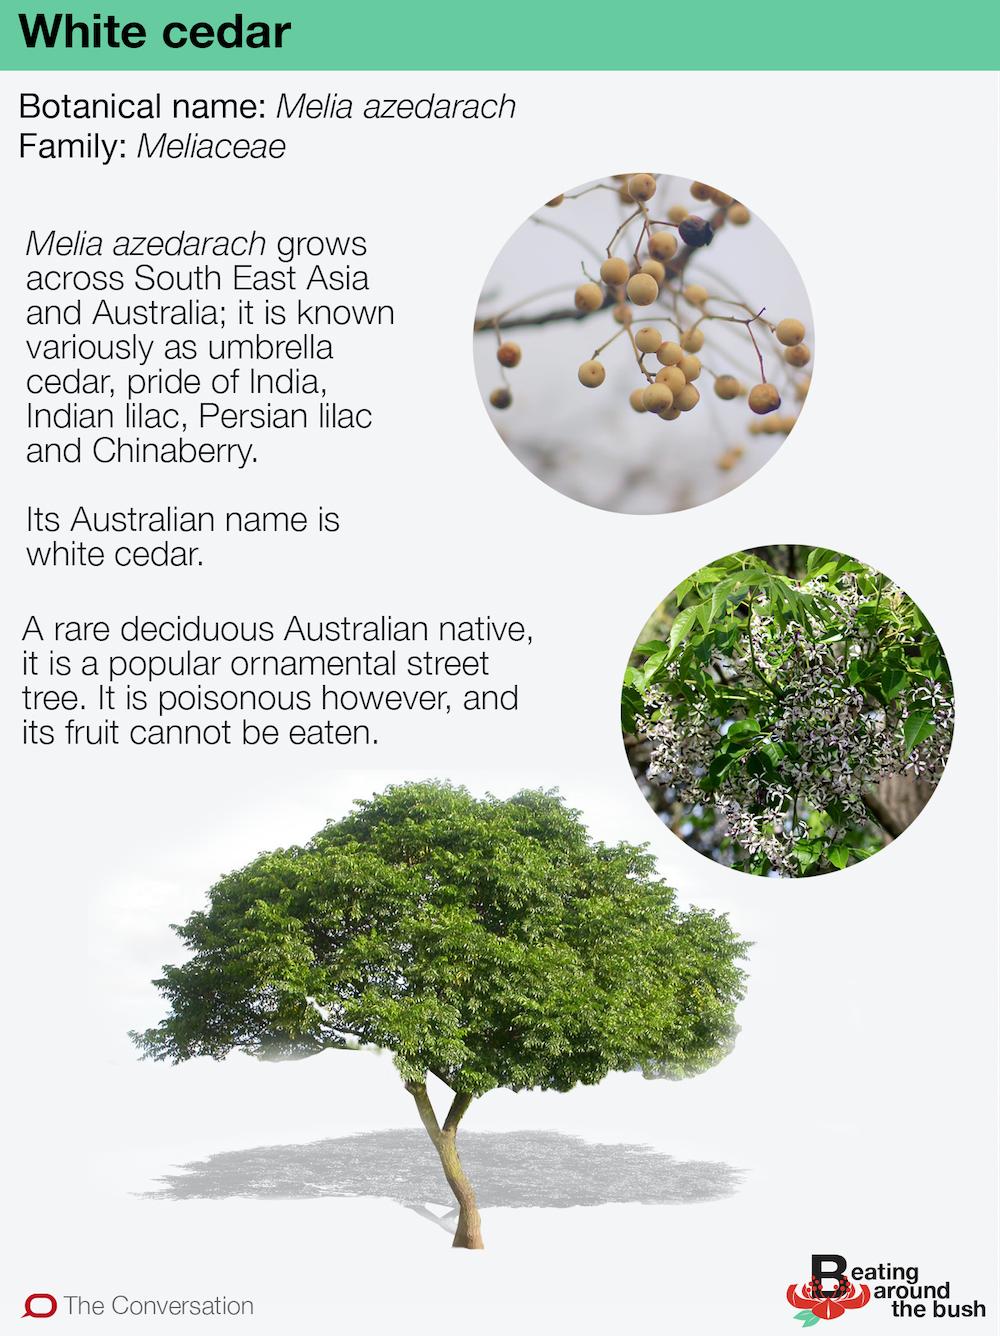 Part Ii More Fruit Of Poisonous Tree >> White Cedar Is A Rare Bird A Winter Deciduous Australian Tree